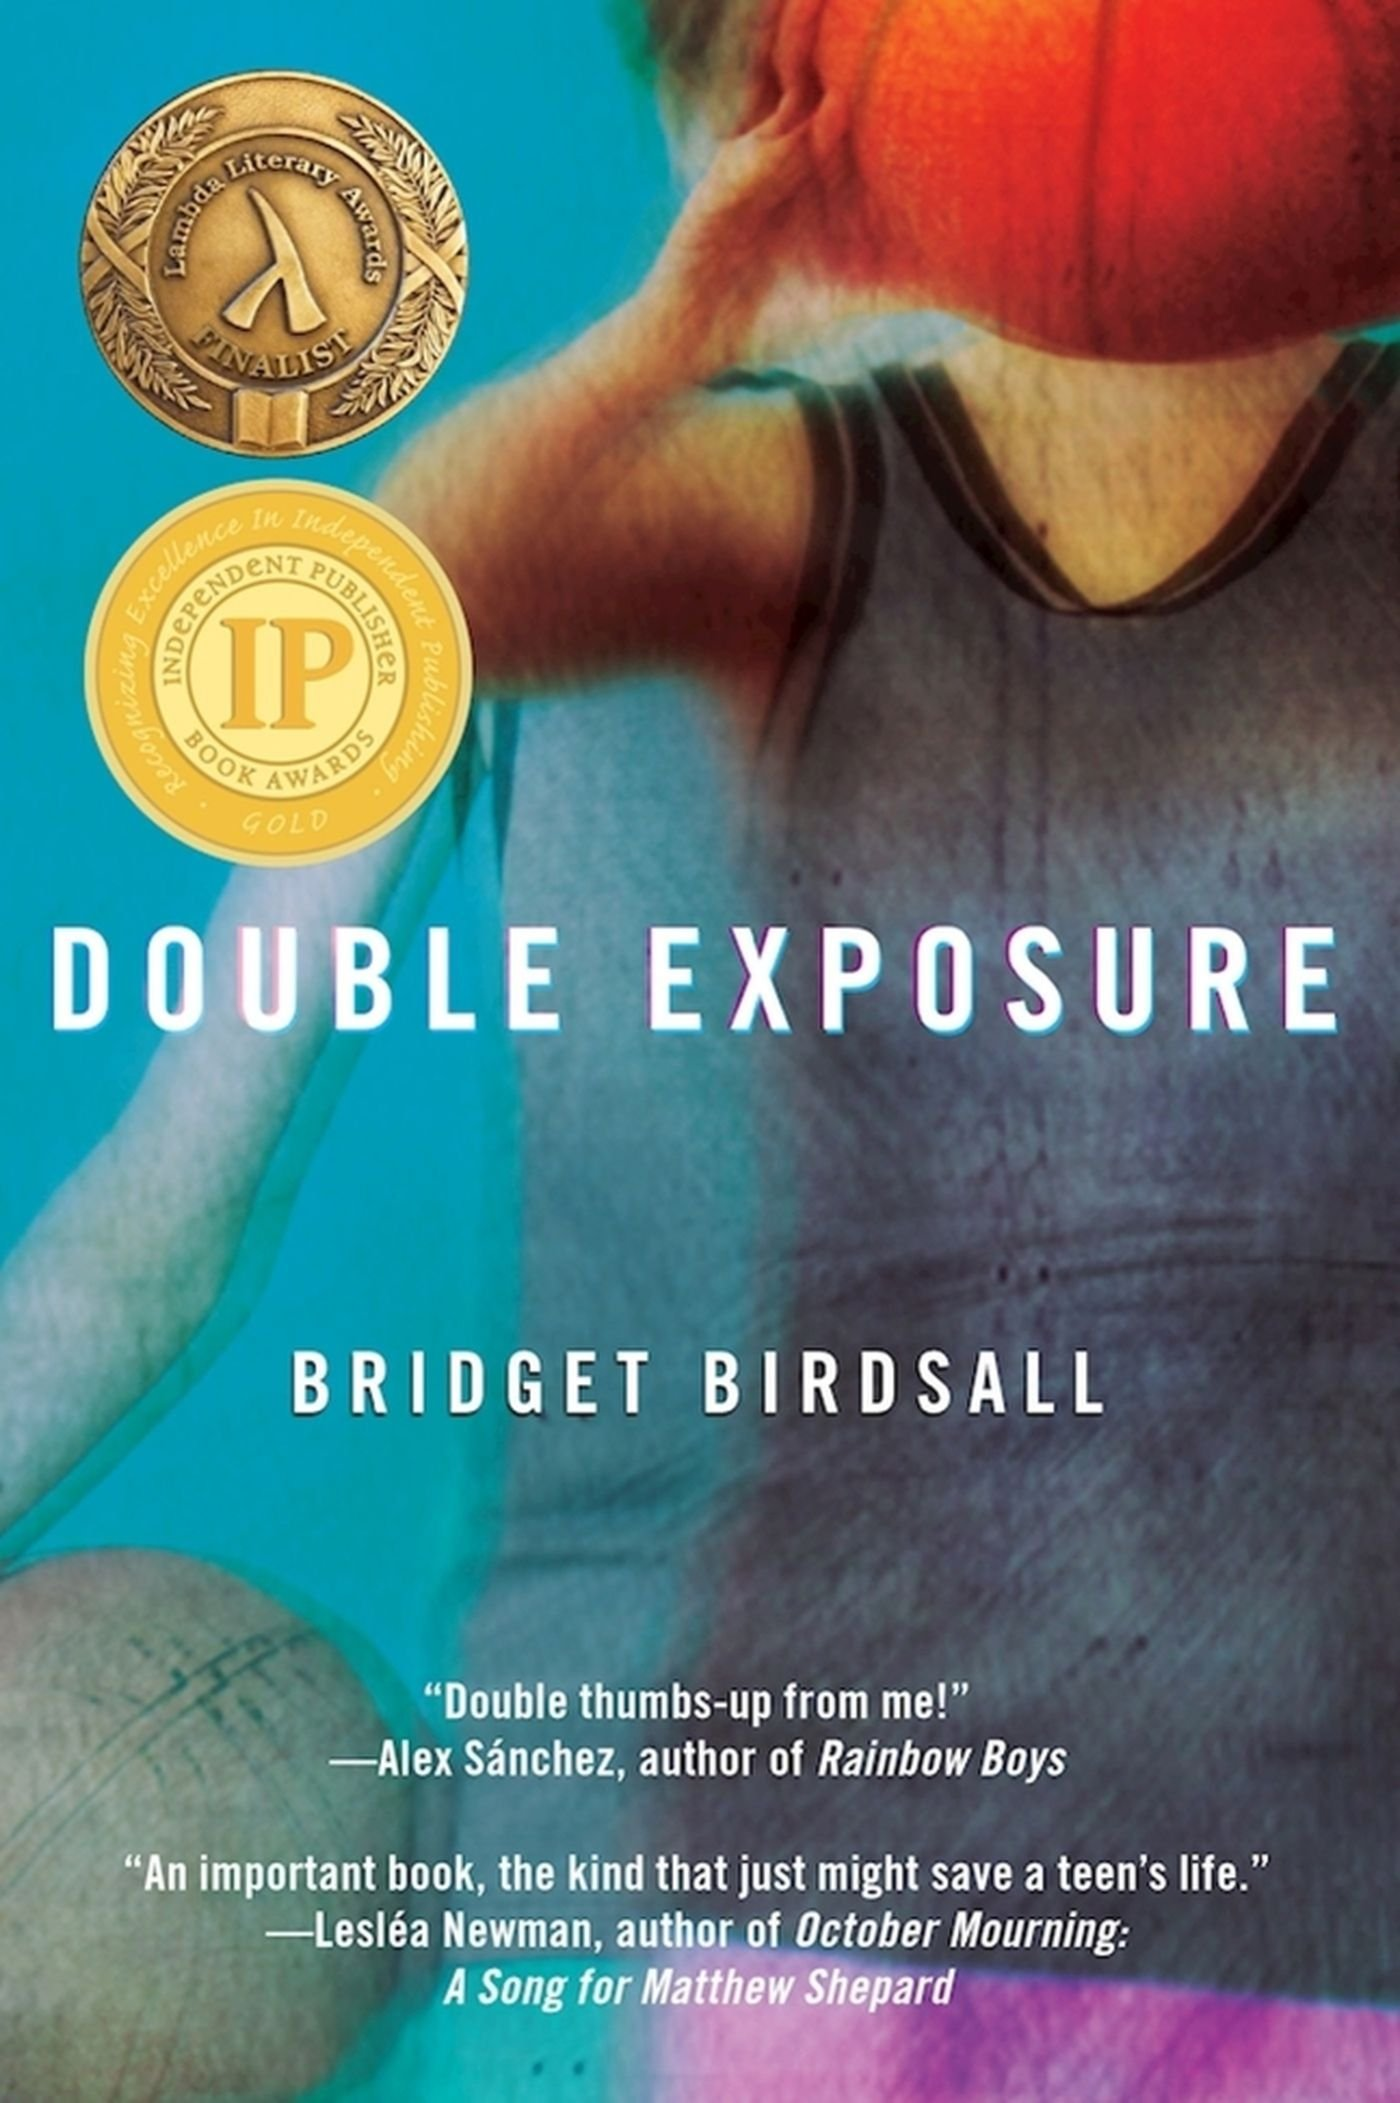 Double Exposure Bridget Birdsall product image